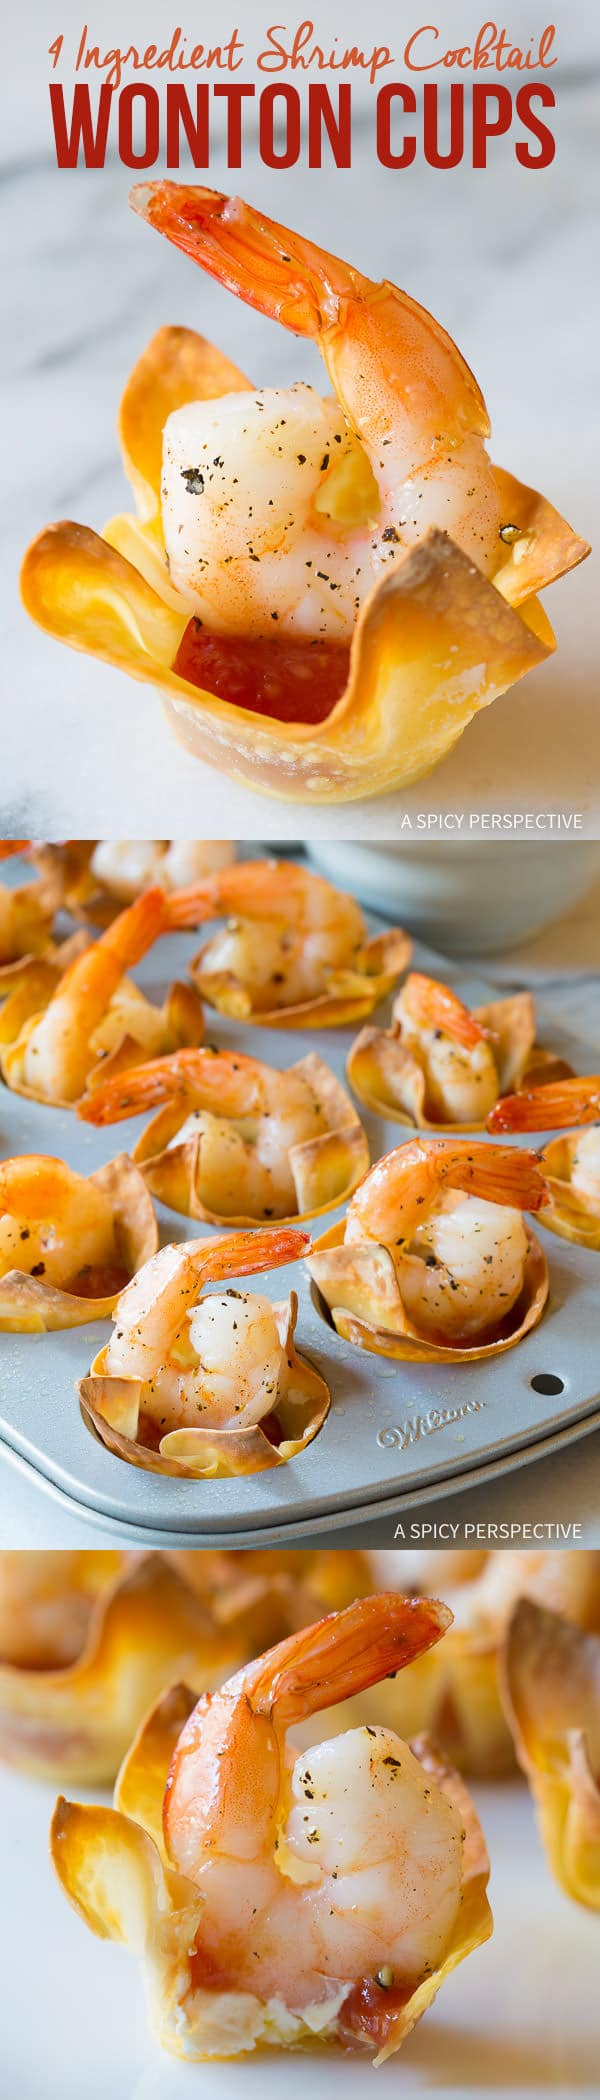 Fabulous 4-Ingredient Shrimp Cocktail Wonton Cups Recipe on ASpicyPerspective.com #holidays